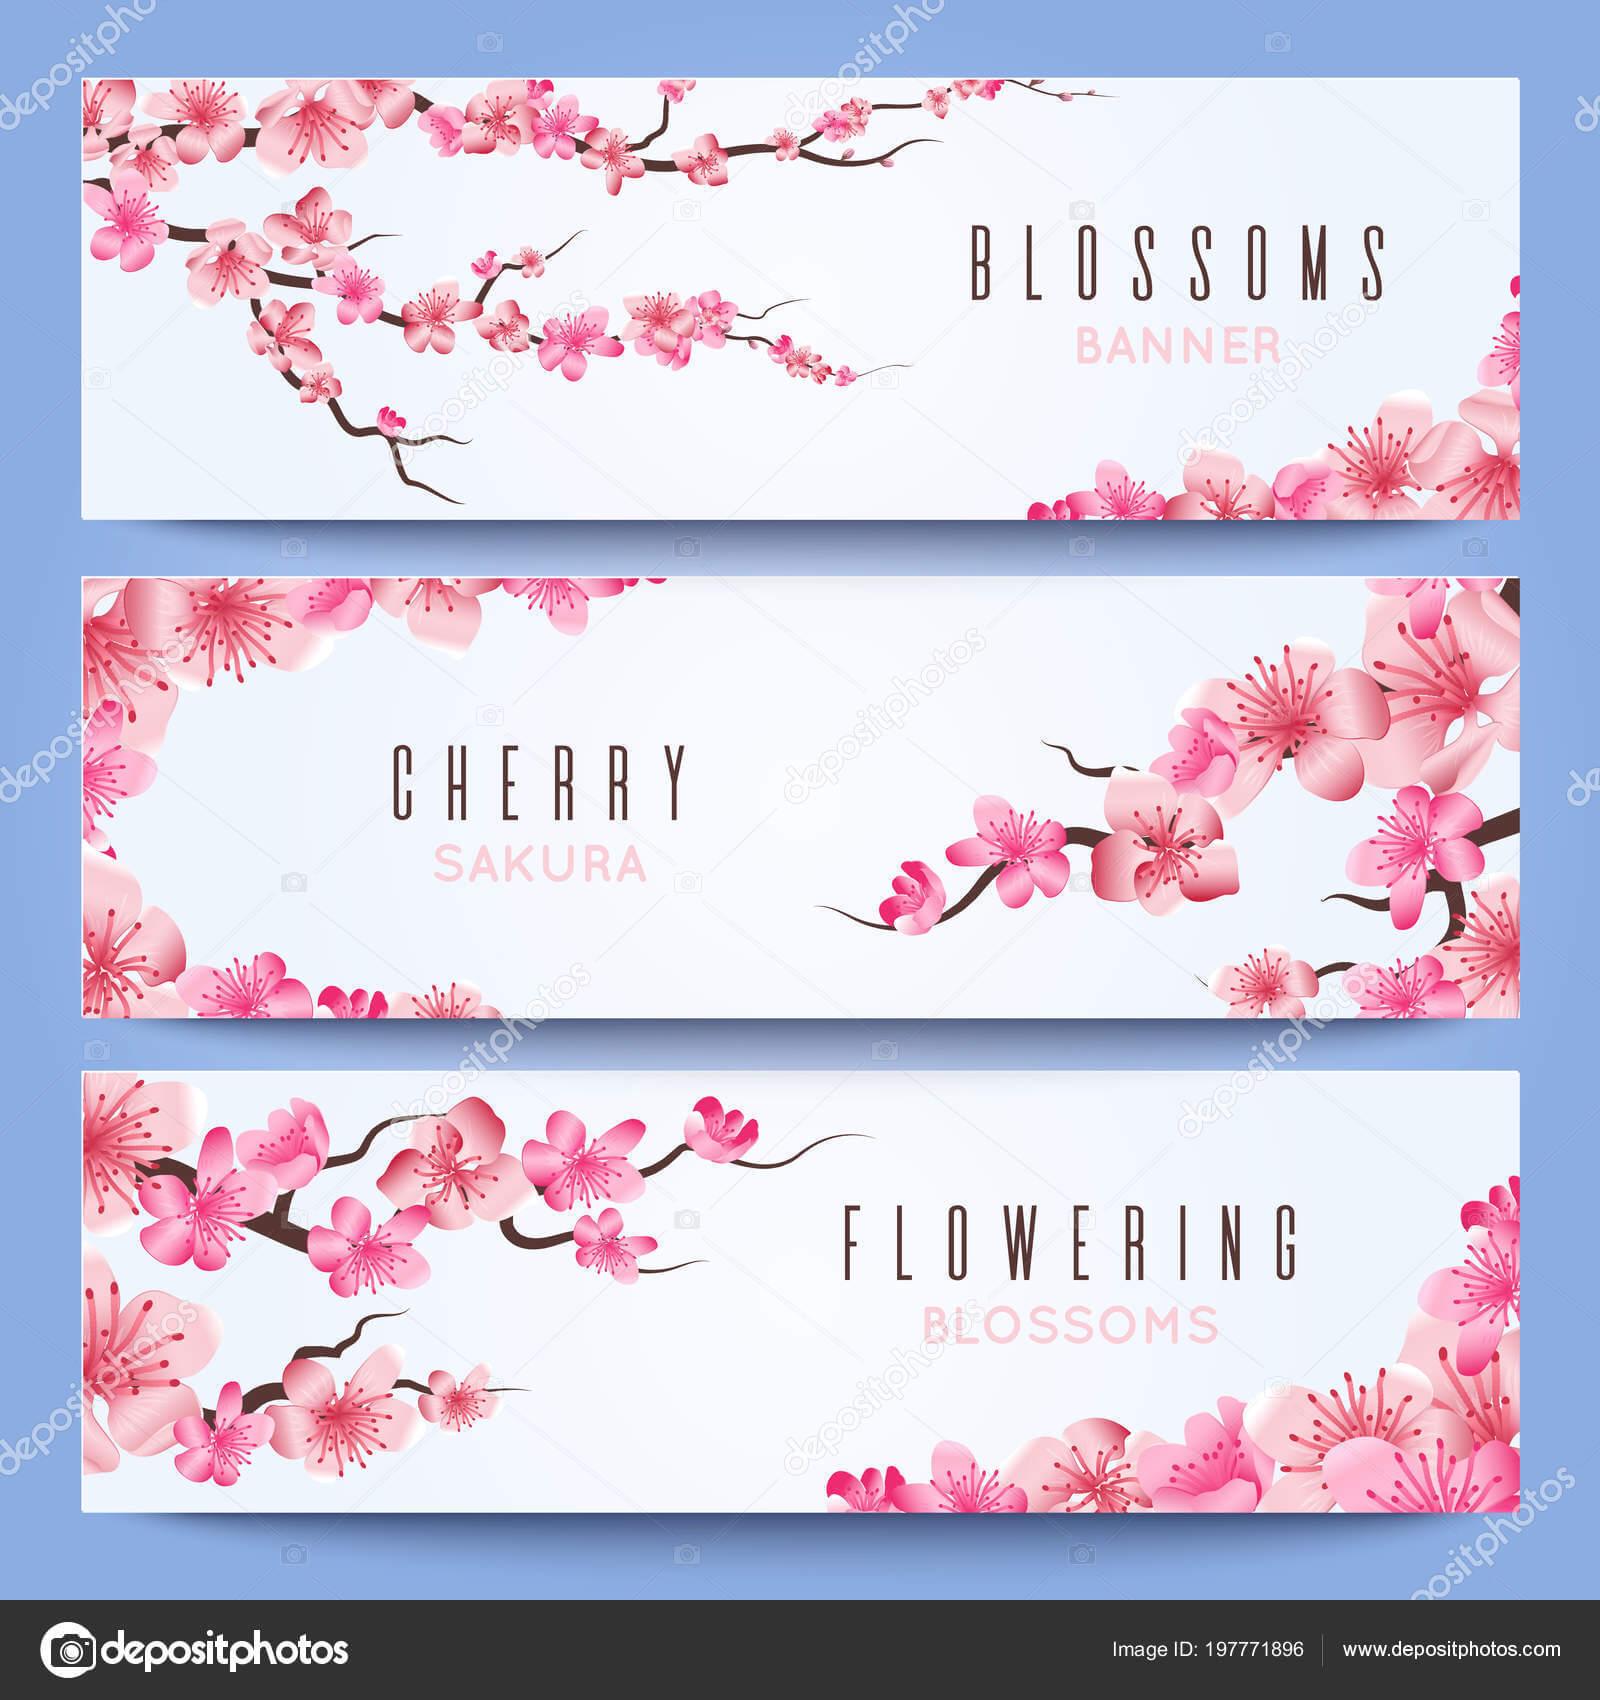 Wedding Banners Template With Spring Japan Sakura, Cherry In Wedding Banner Design Templates